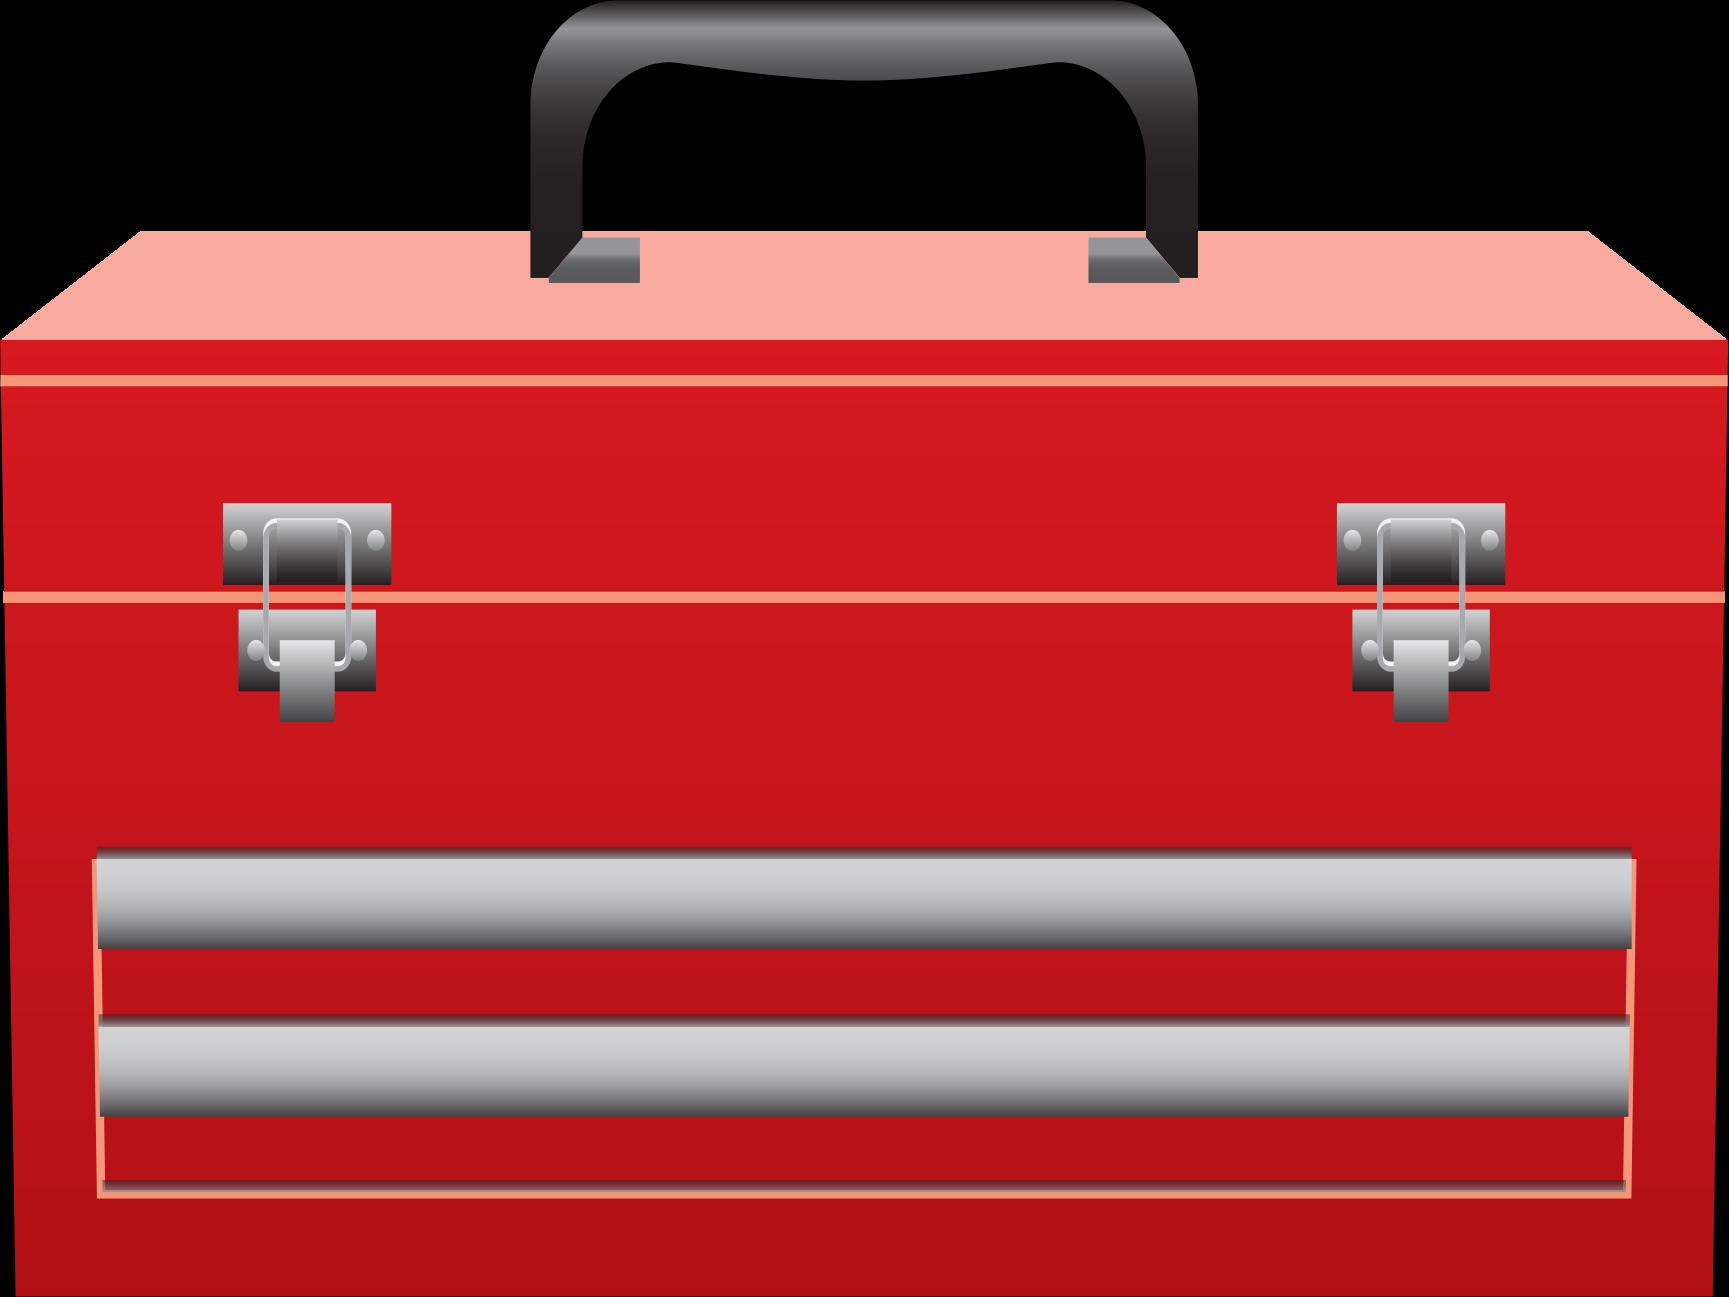 Clipart tool box.